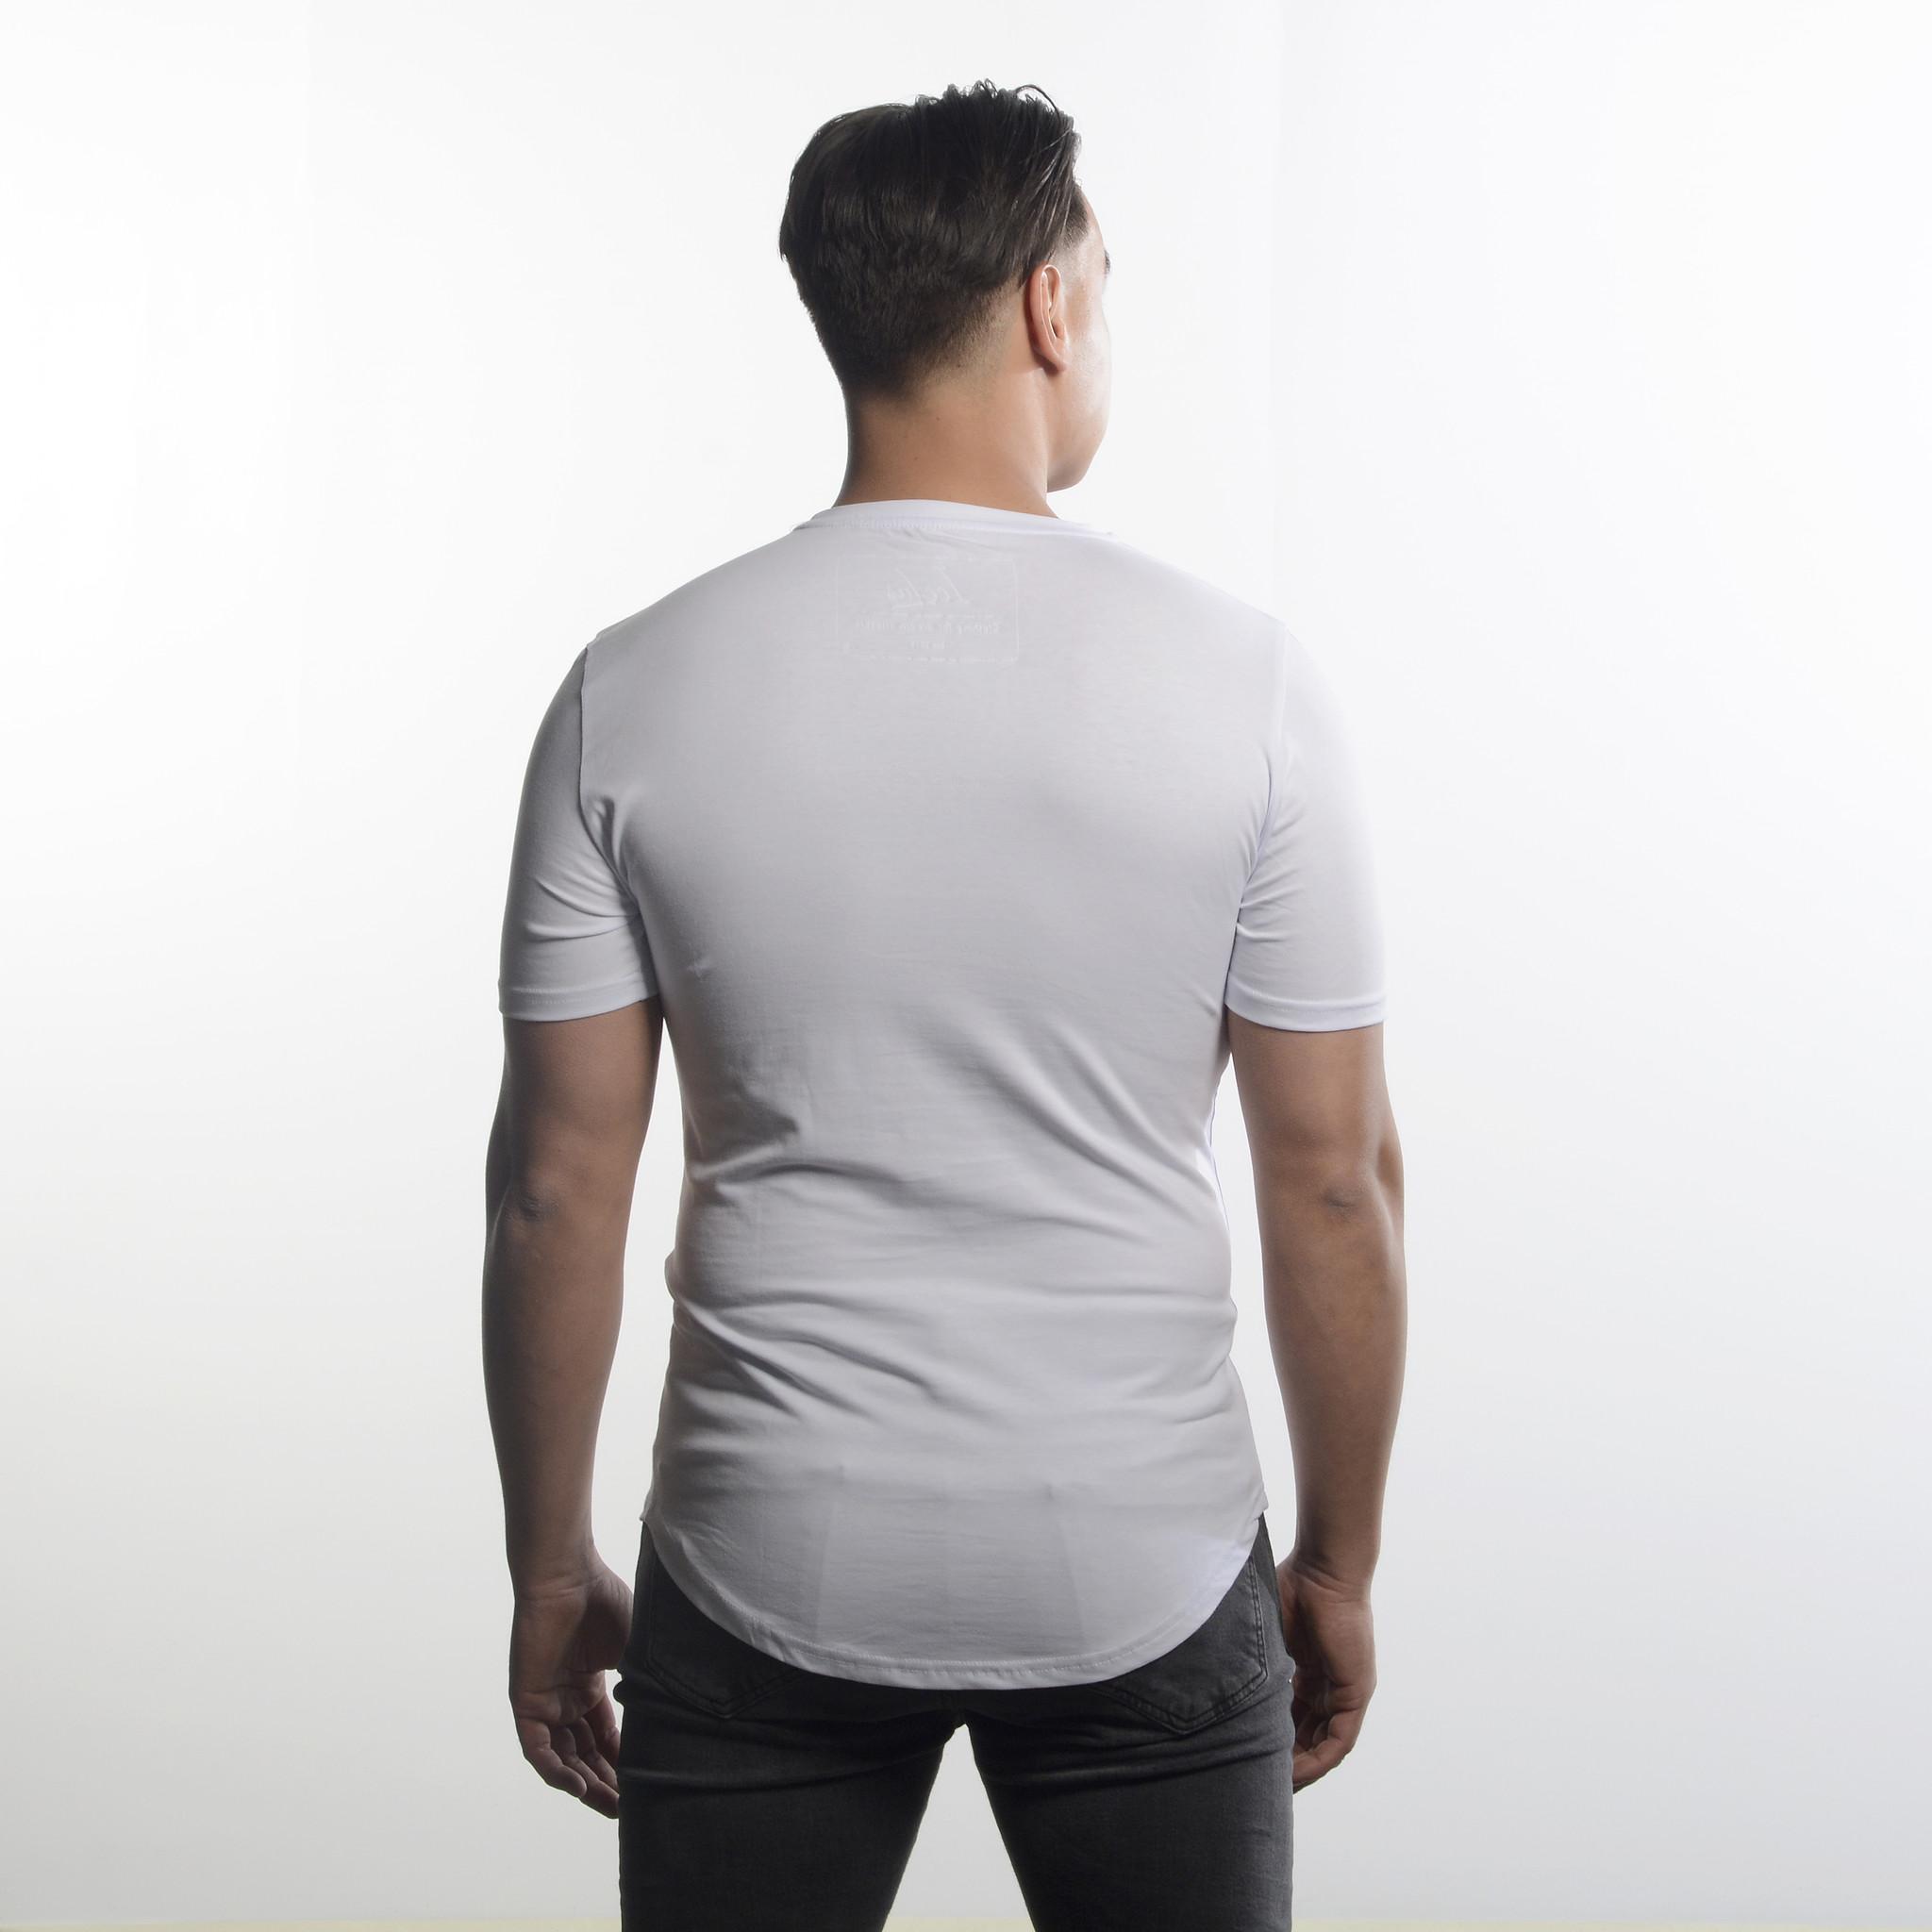 Icelus Clothing The Movement White